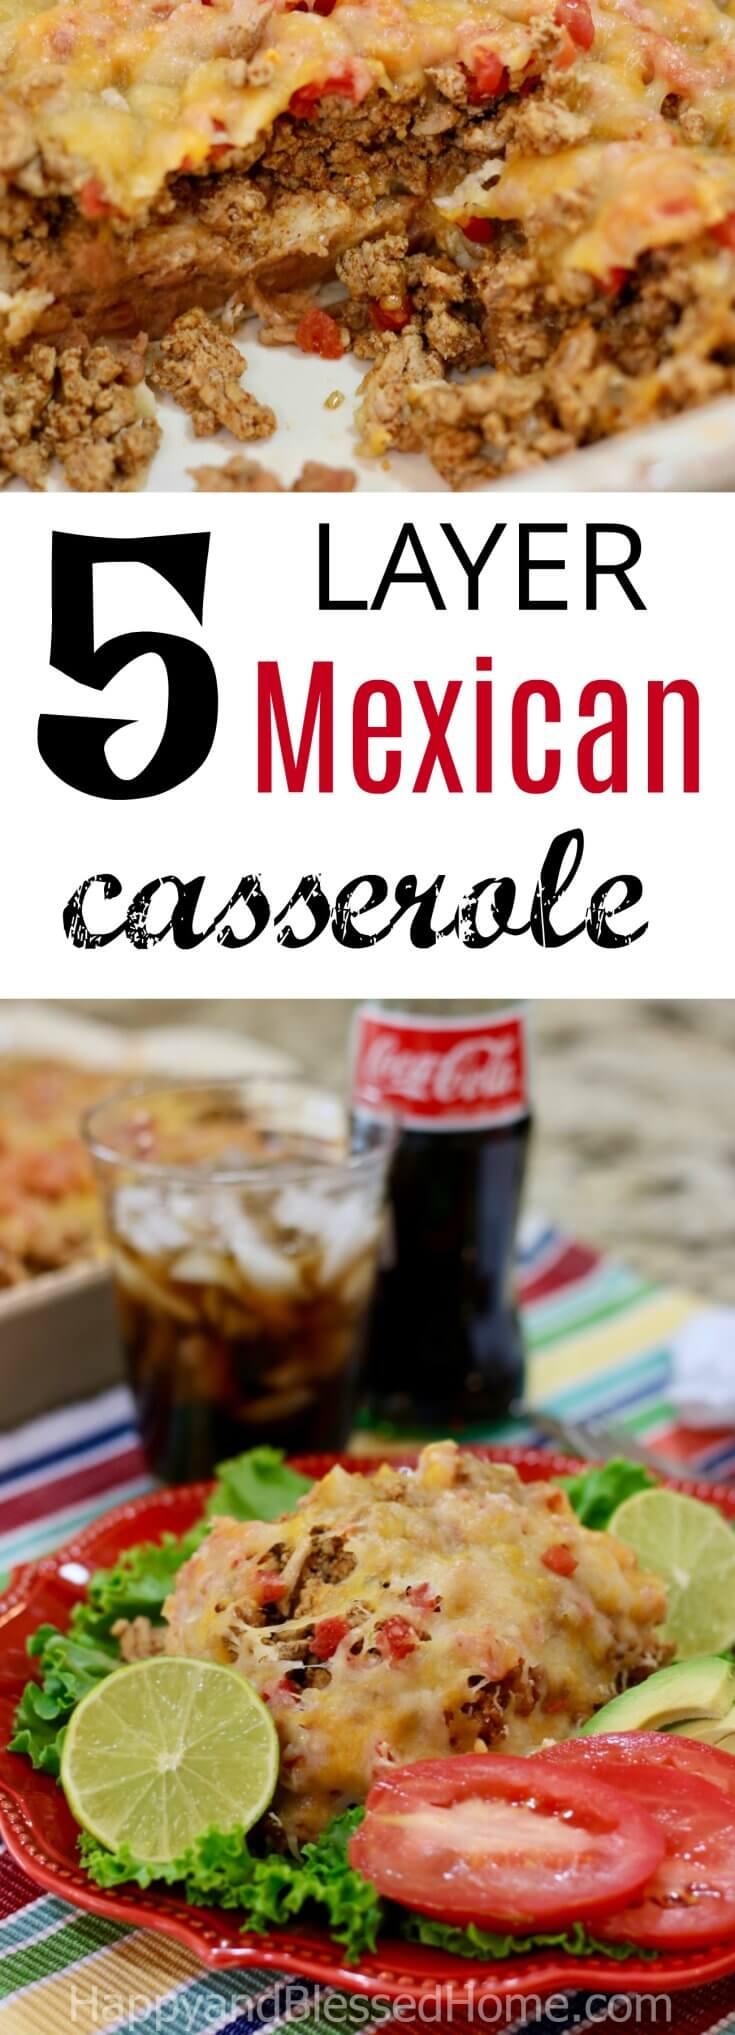 Easy Recipe for 5 Layer Mexican Casserole